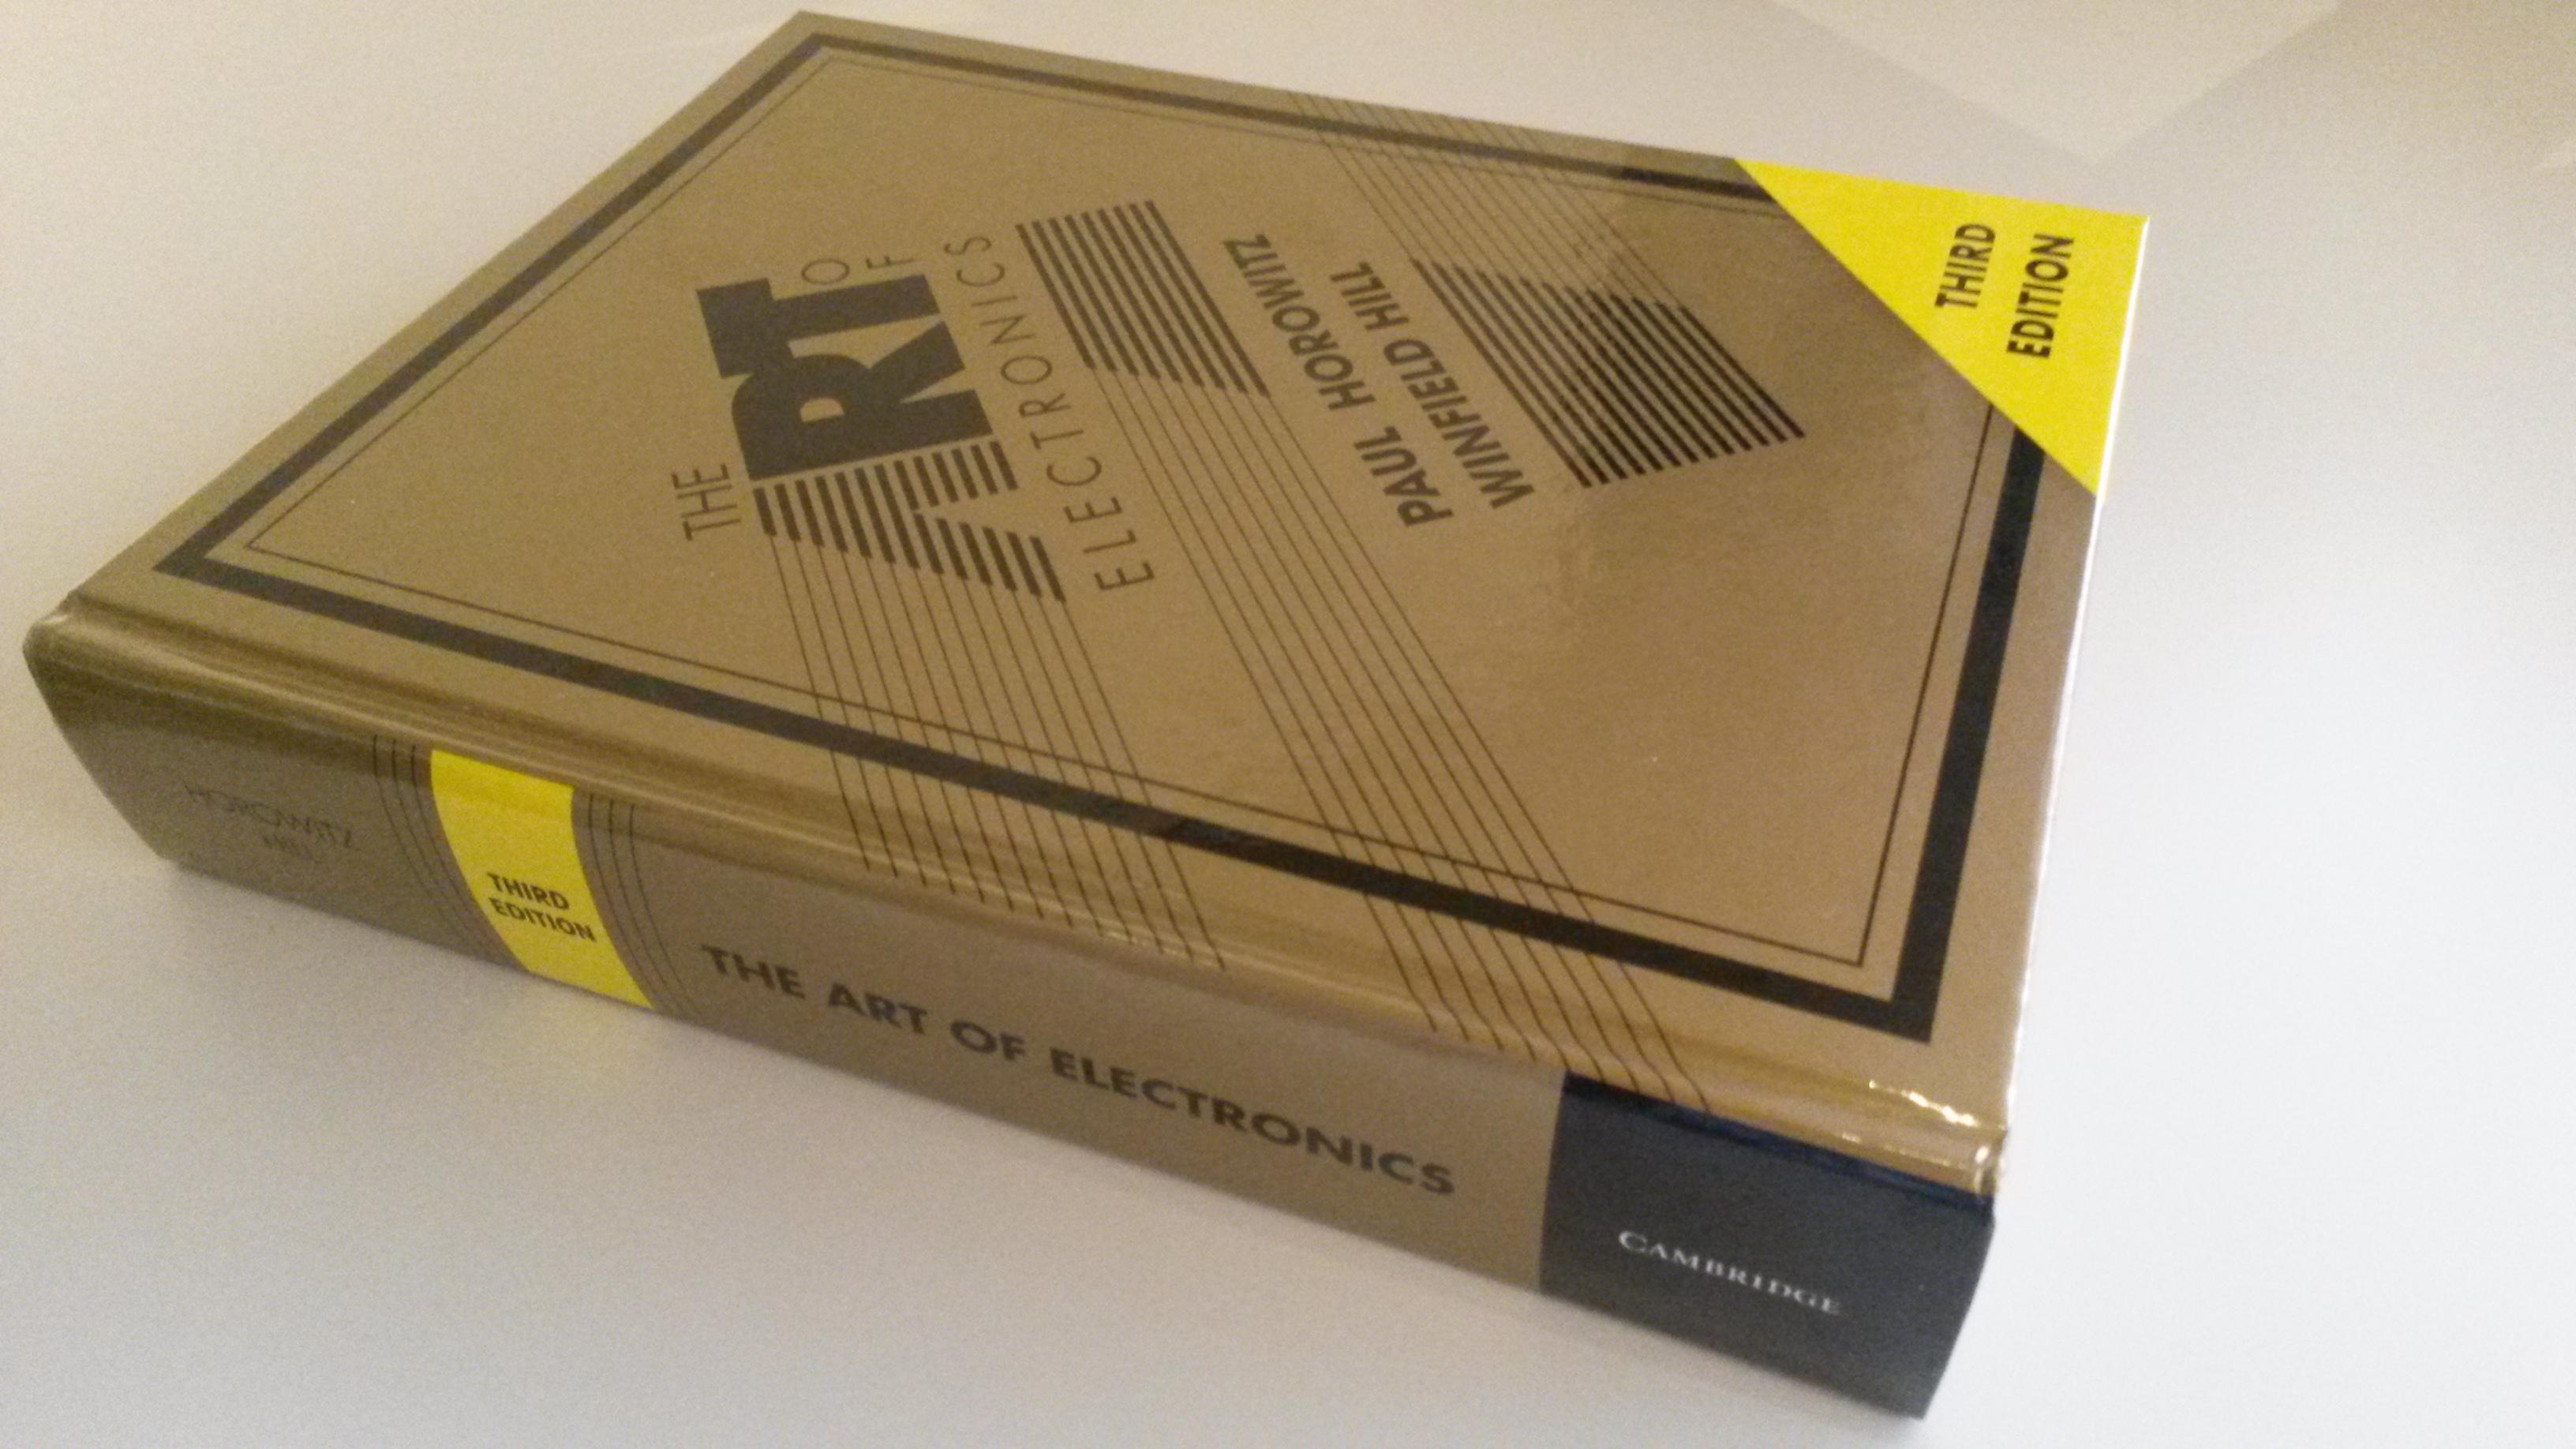 The Art of Electronics – Third Edition | soldernerd